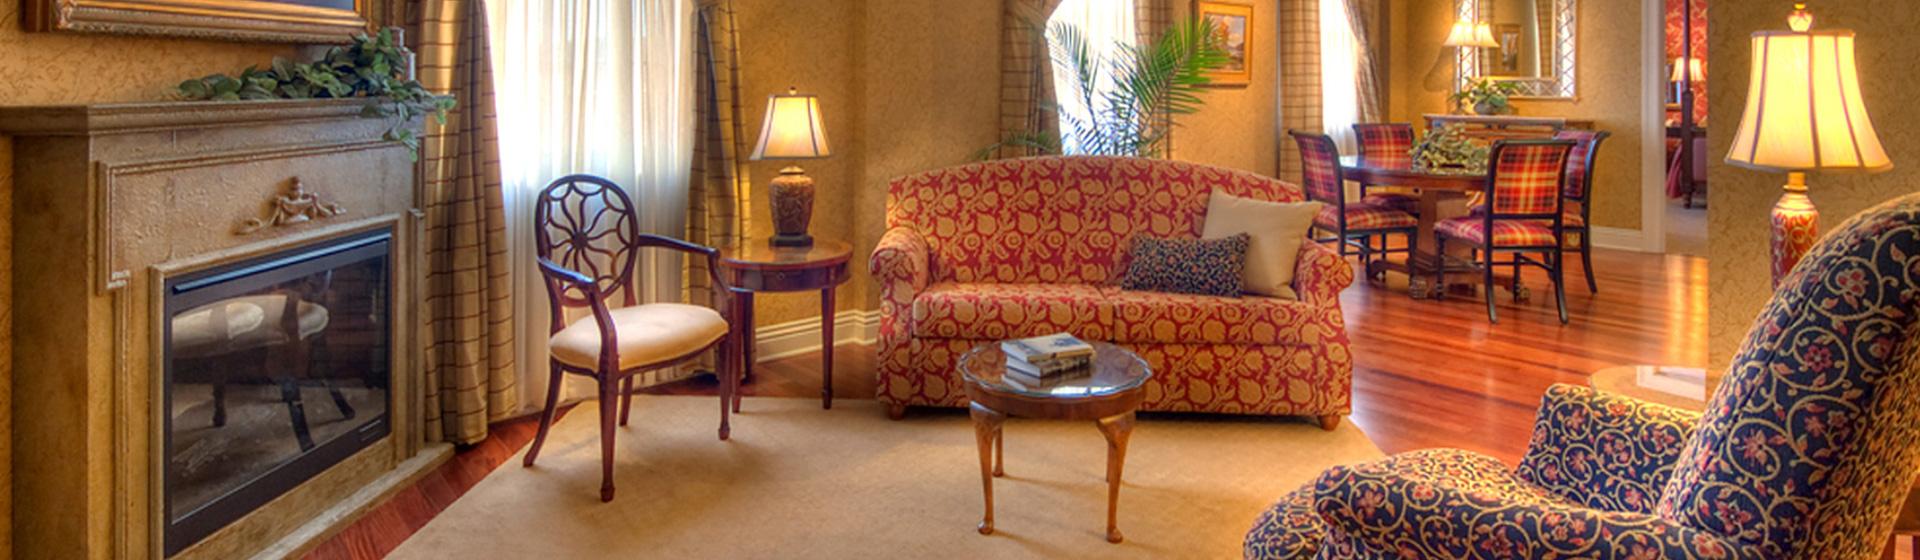 Deluxe Suite of Charley Creek Inn - Wabash, Indiana